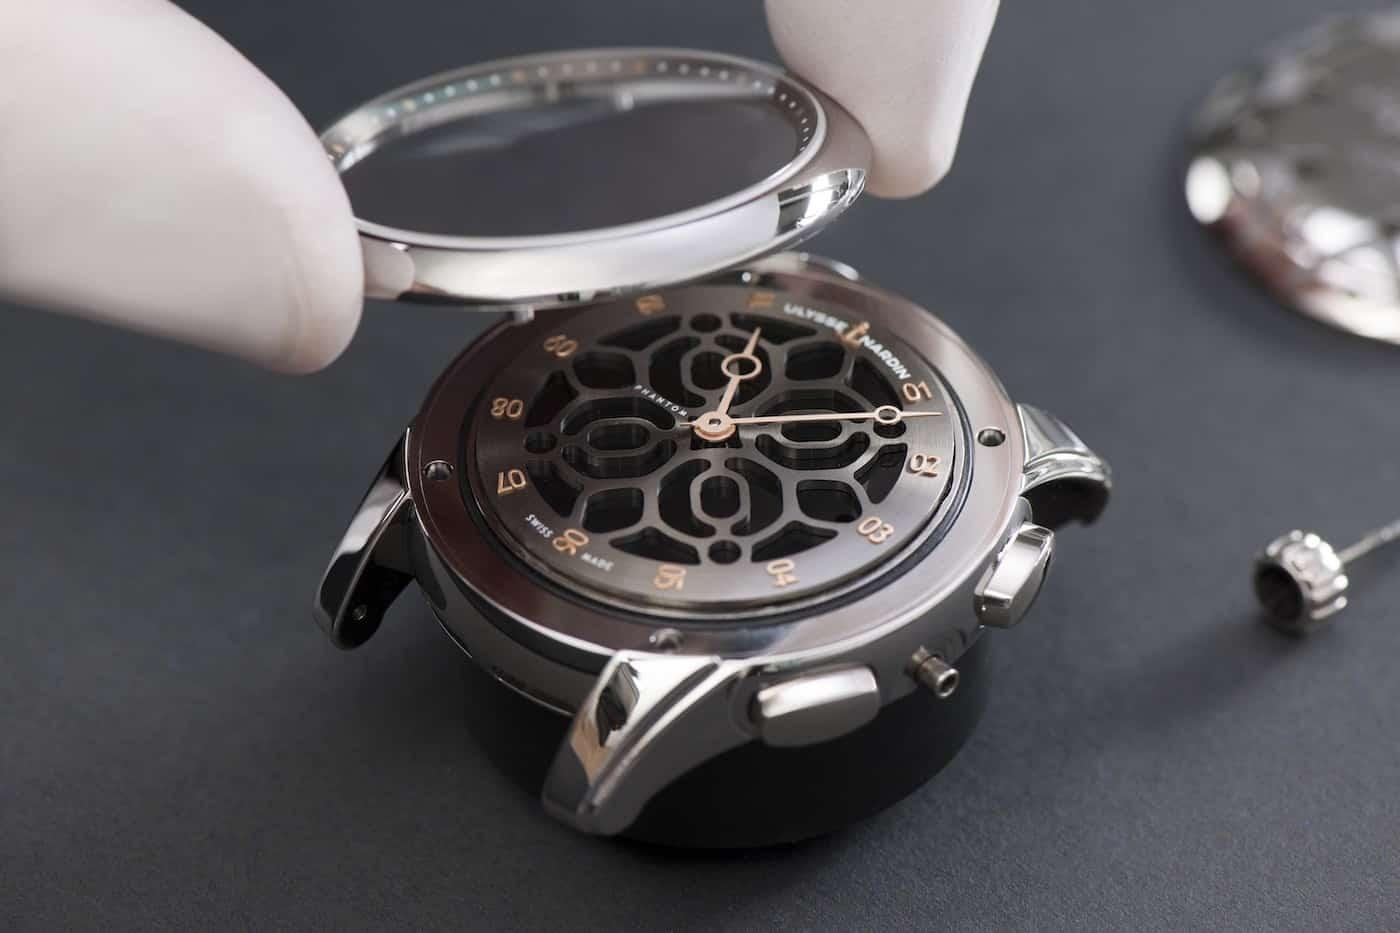 Ulysse Nardin Hourstriker Phantom Limited Edition Watch Devialet 4